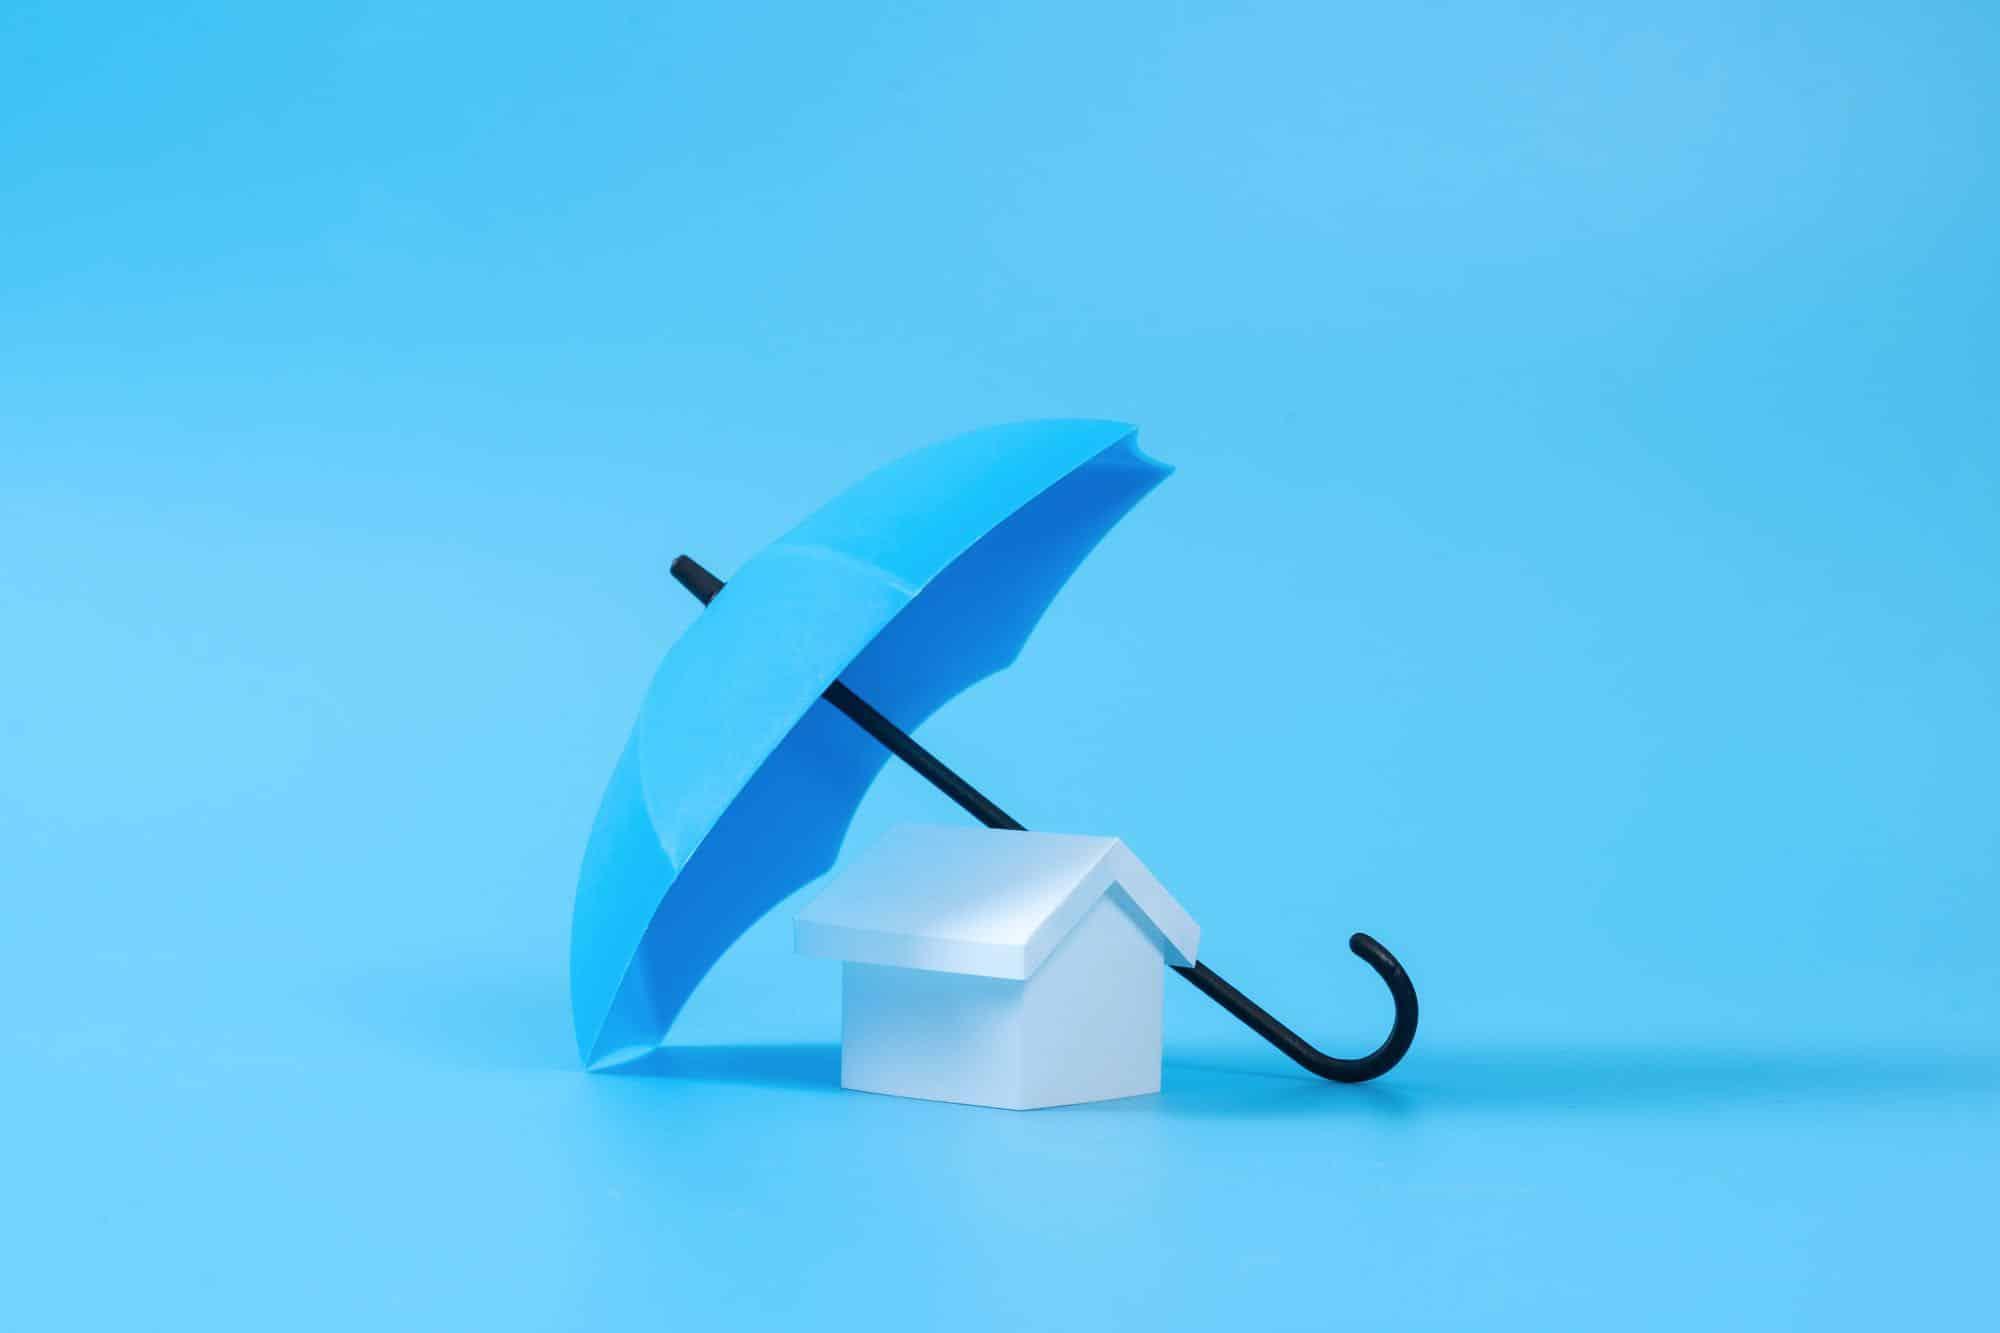 house-model-under-blue-color-umbrella-ETENSY7.jpg